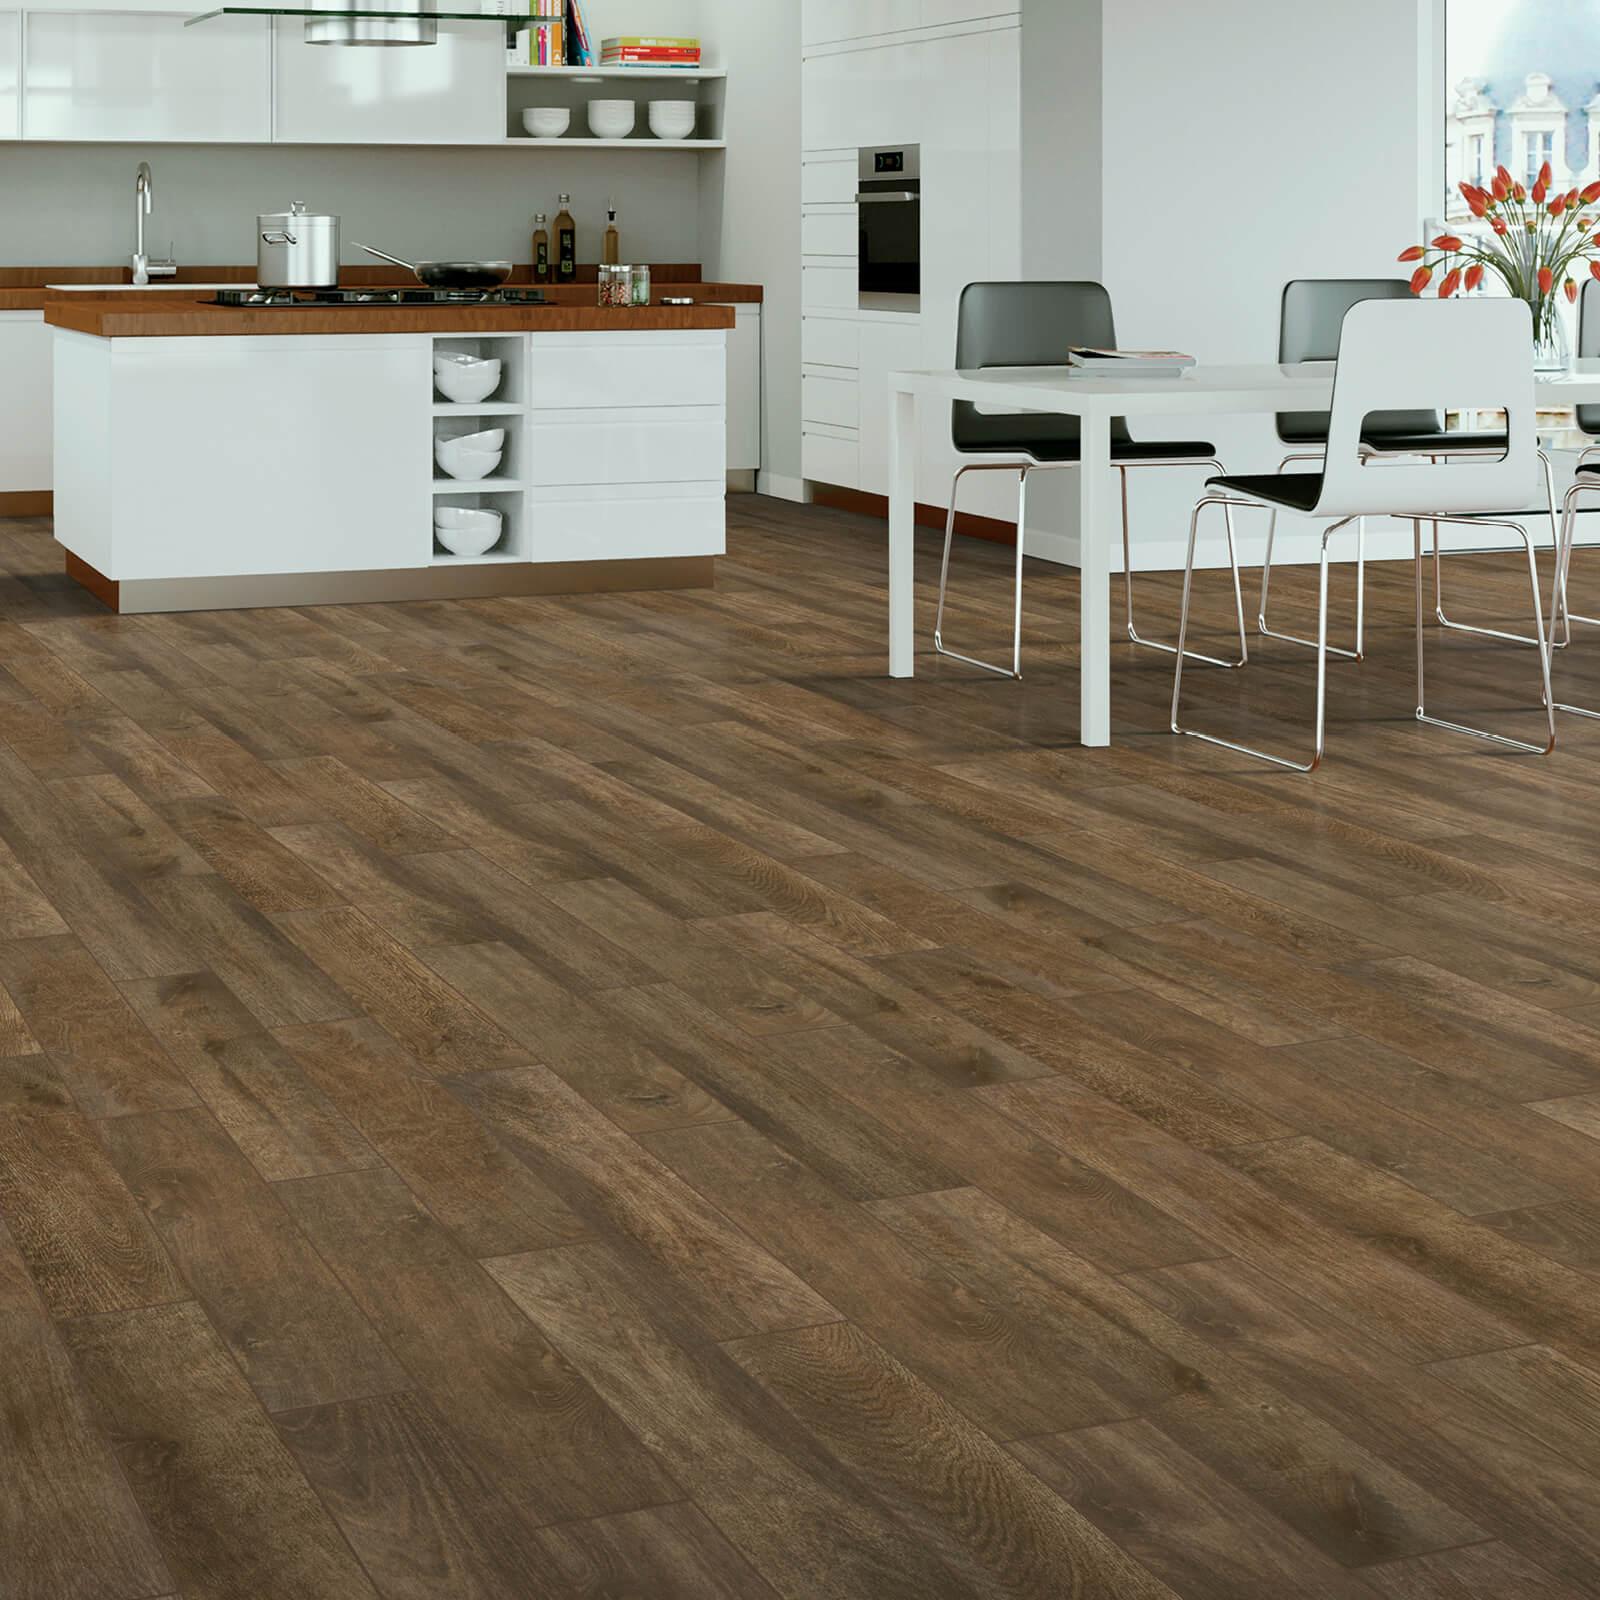 Tile in Kitchen   Haley's Flooring & Interiors